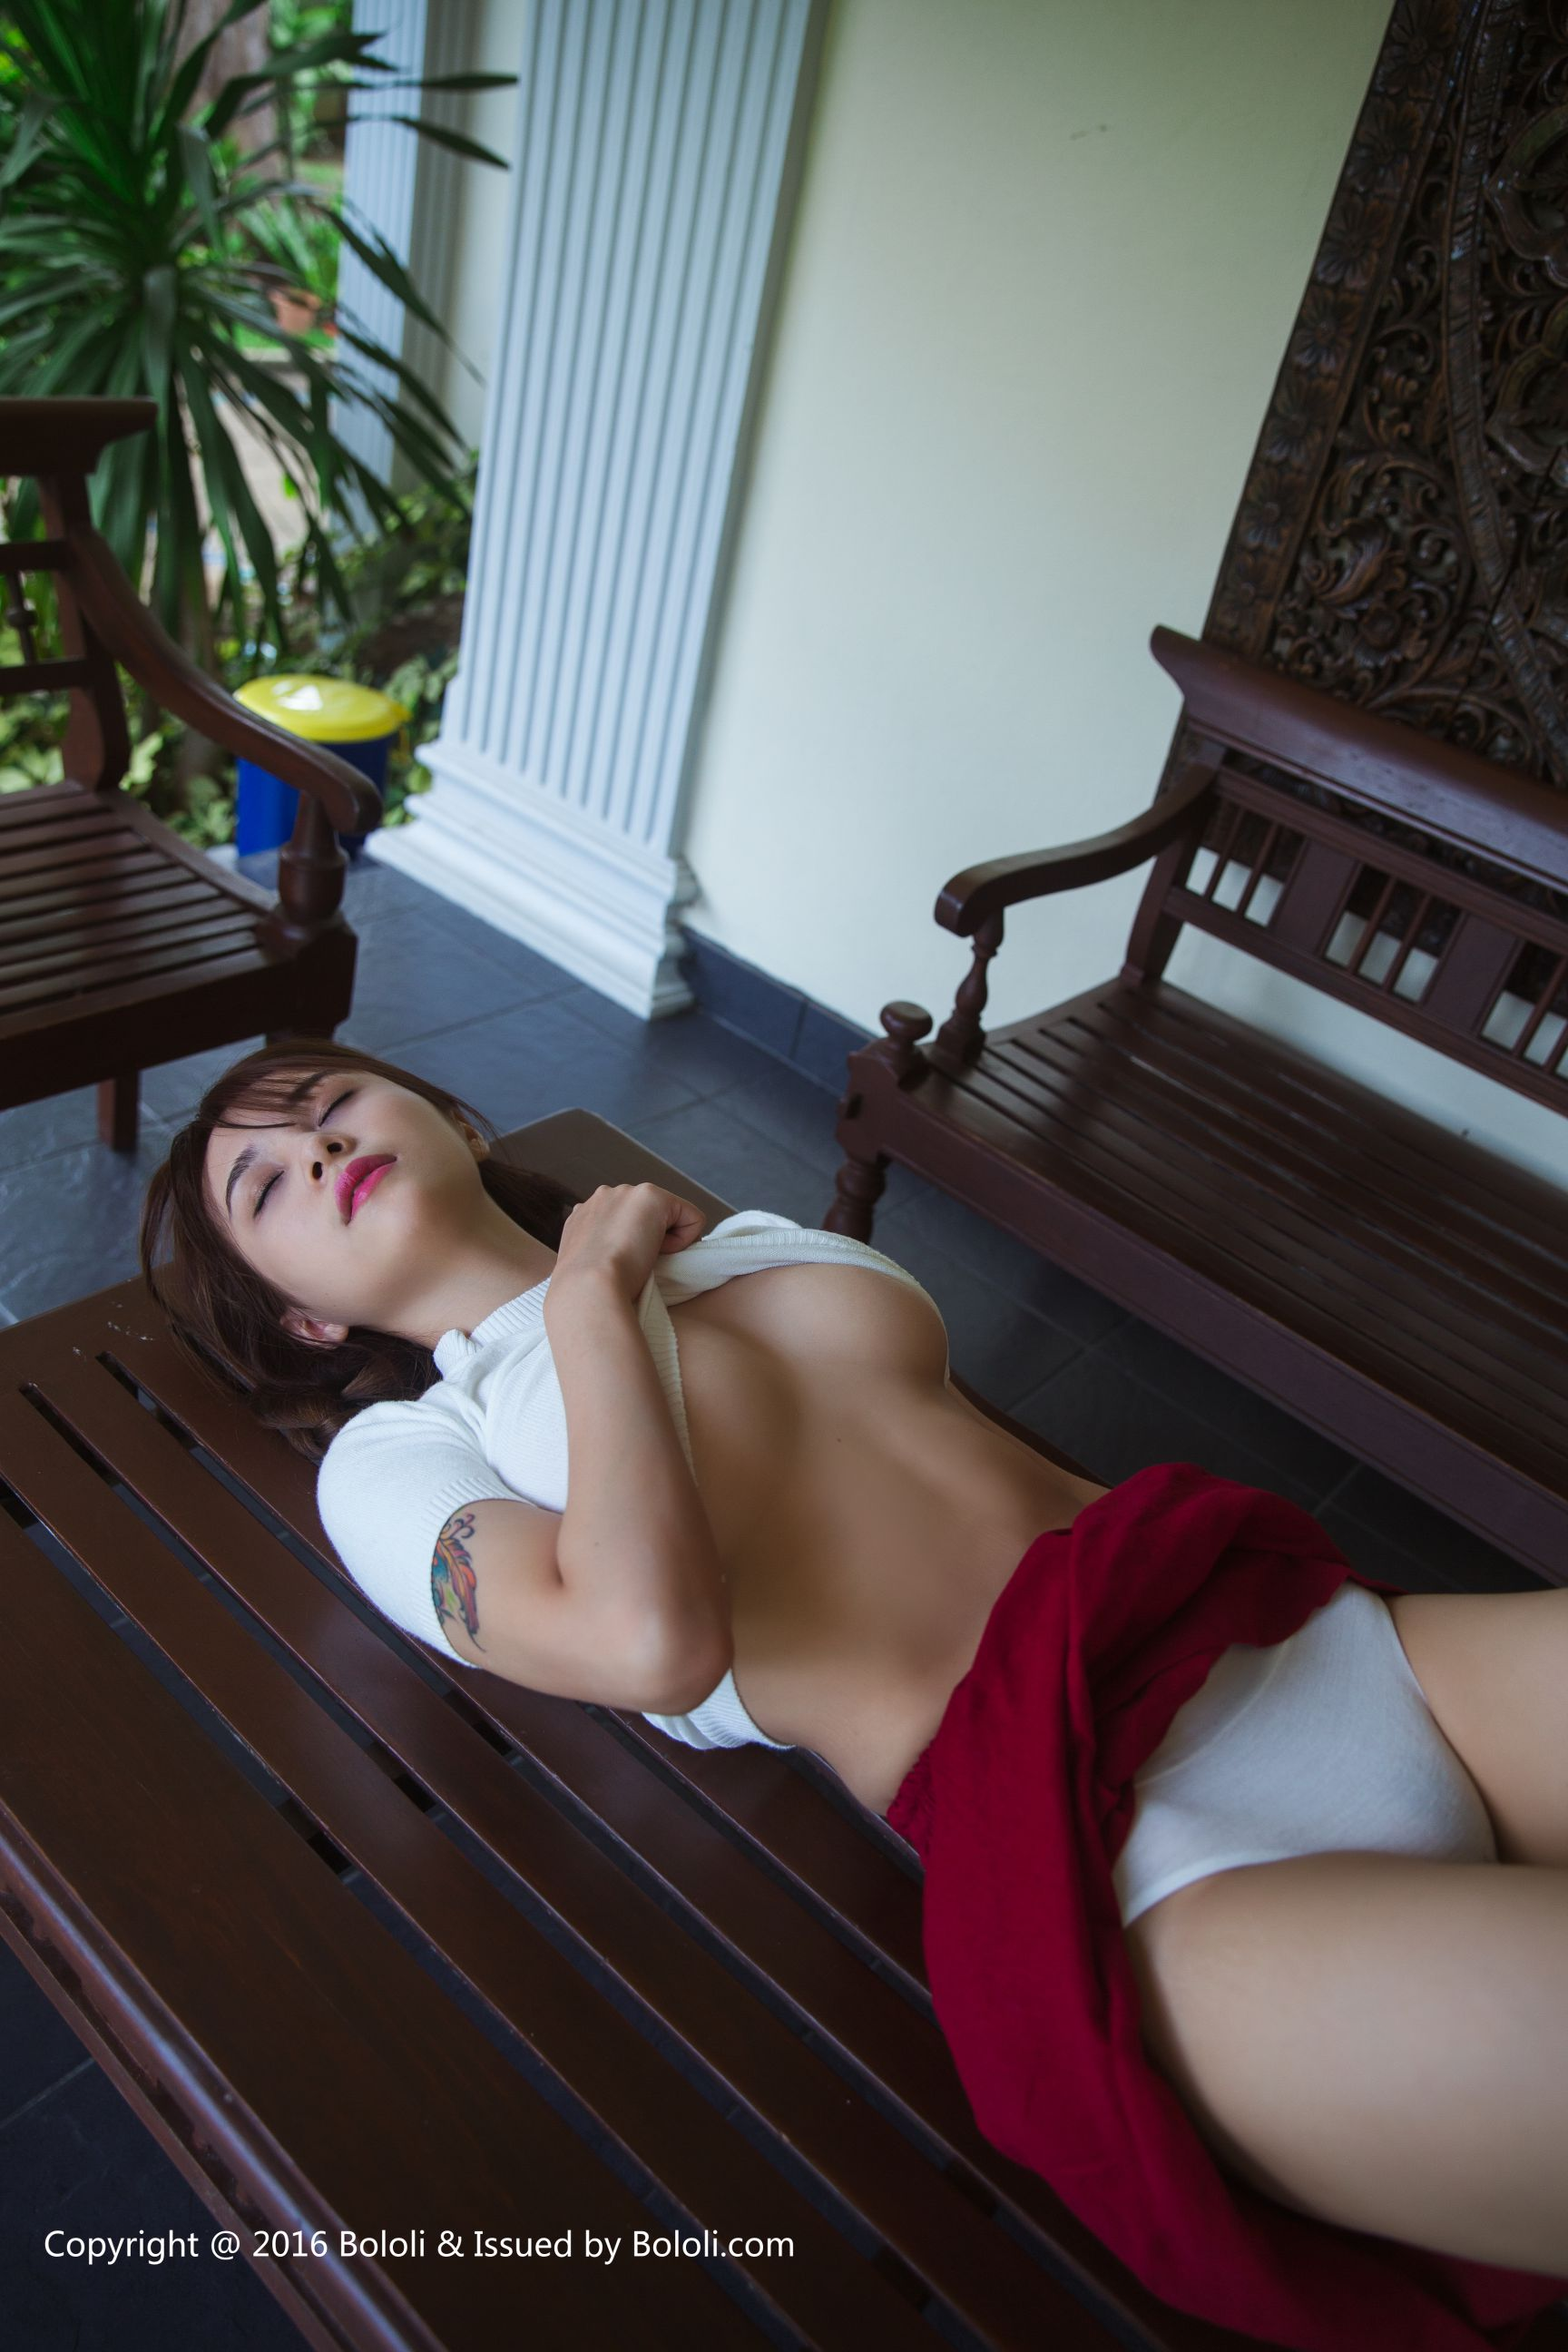 [BoLoLi波萝社] BOL002 夏美酱 普吉岛丝袜美图[40P]